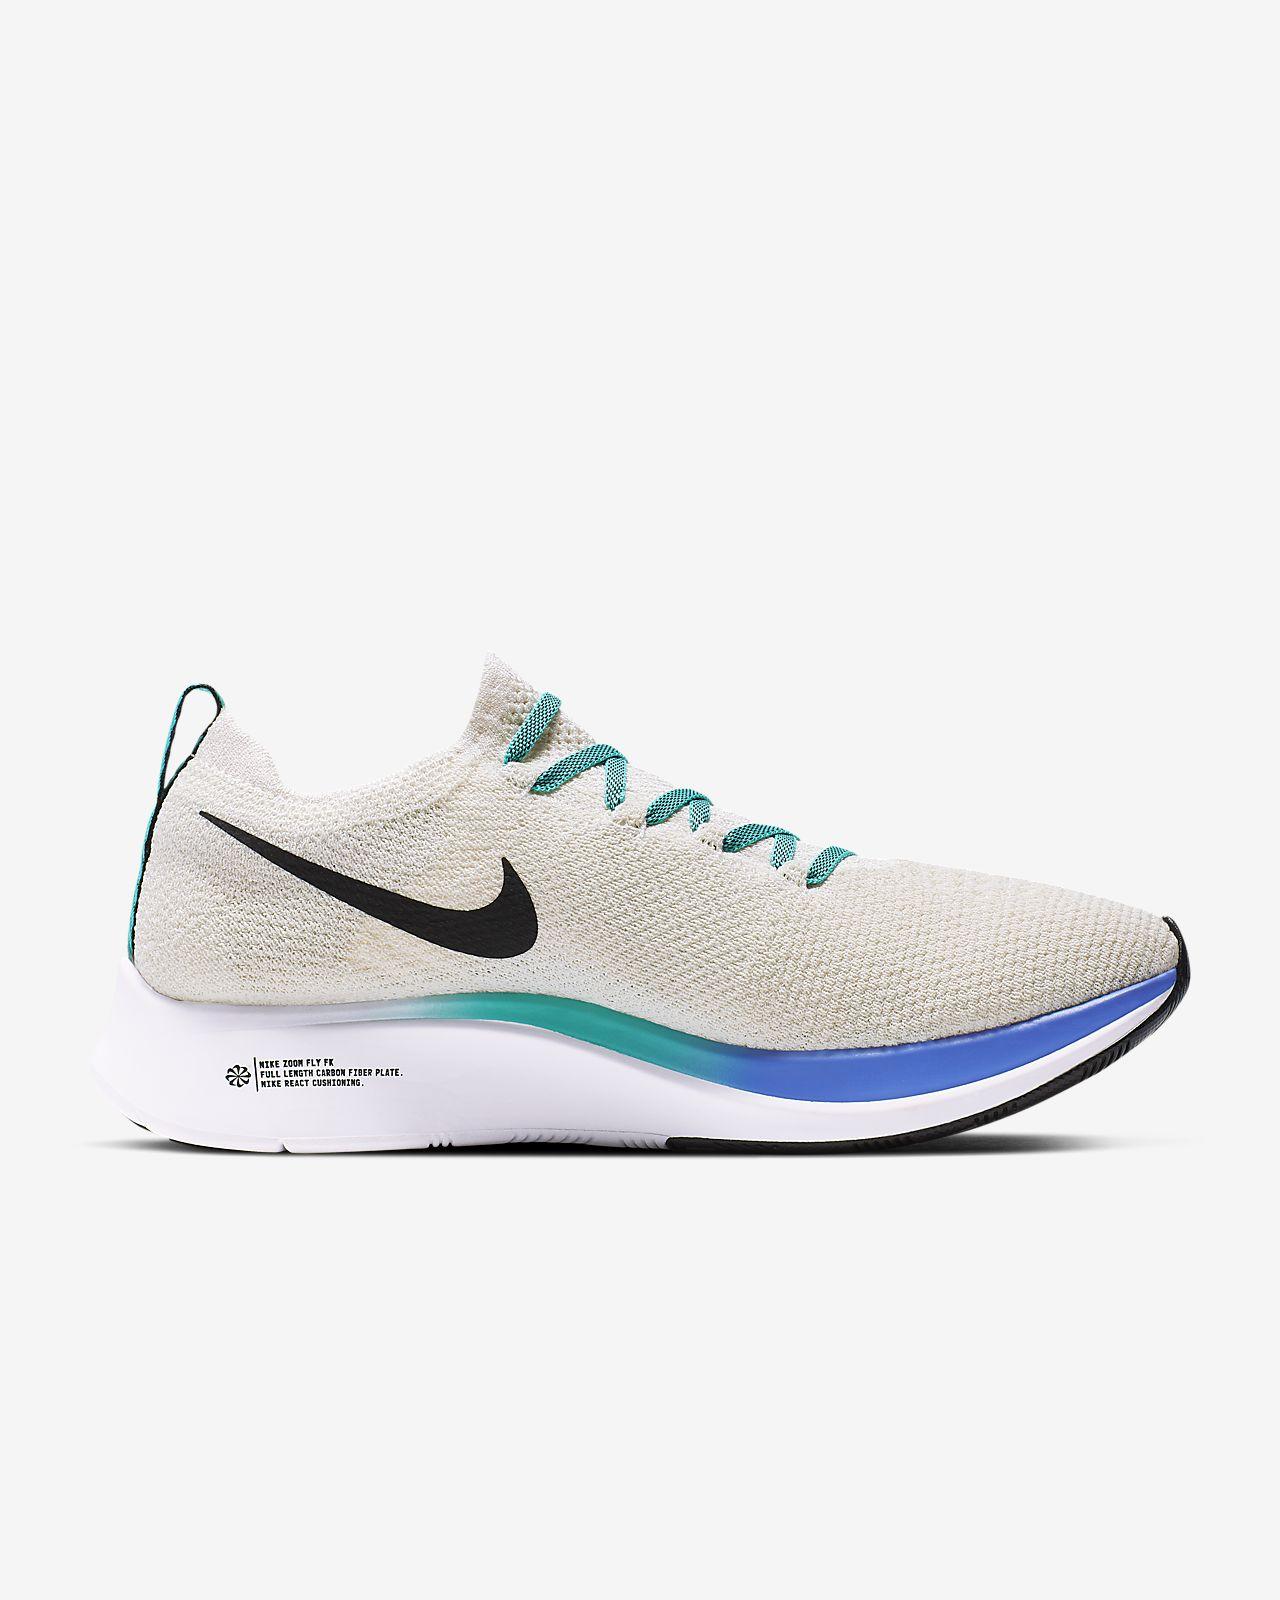 07e10c29f2490 Calzado de running para mujer Nike Zoom Fly Flyknit. Nike.com MX